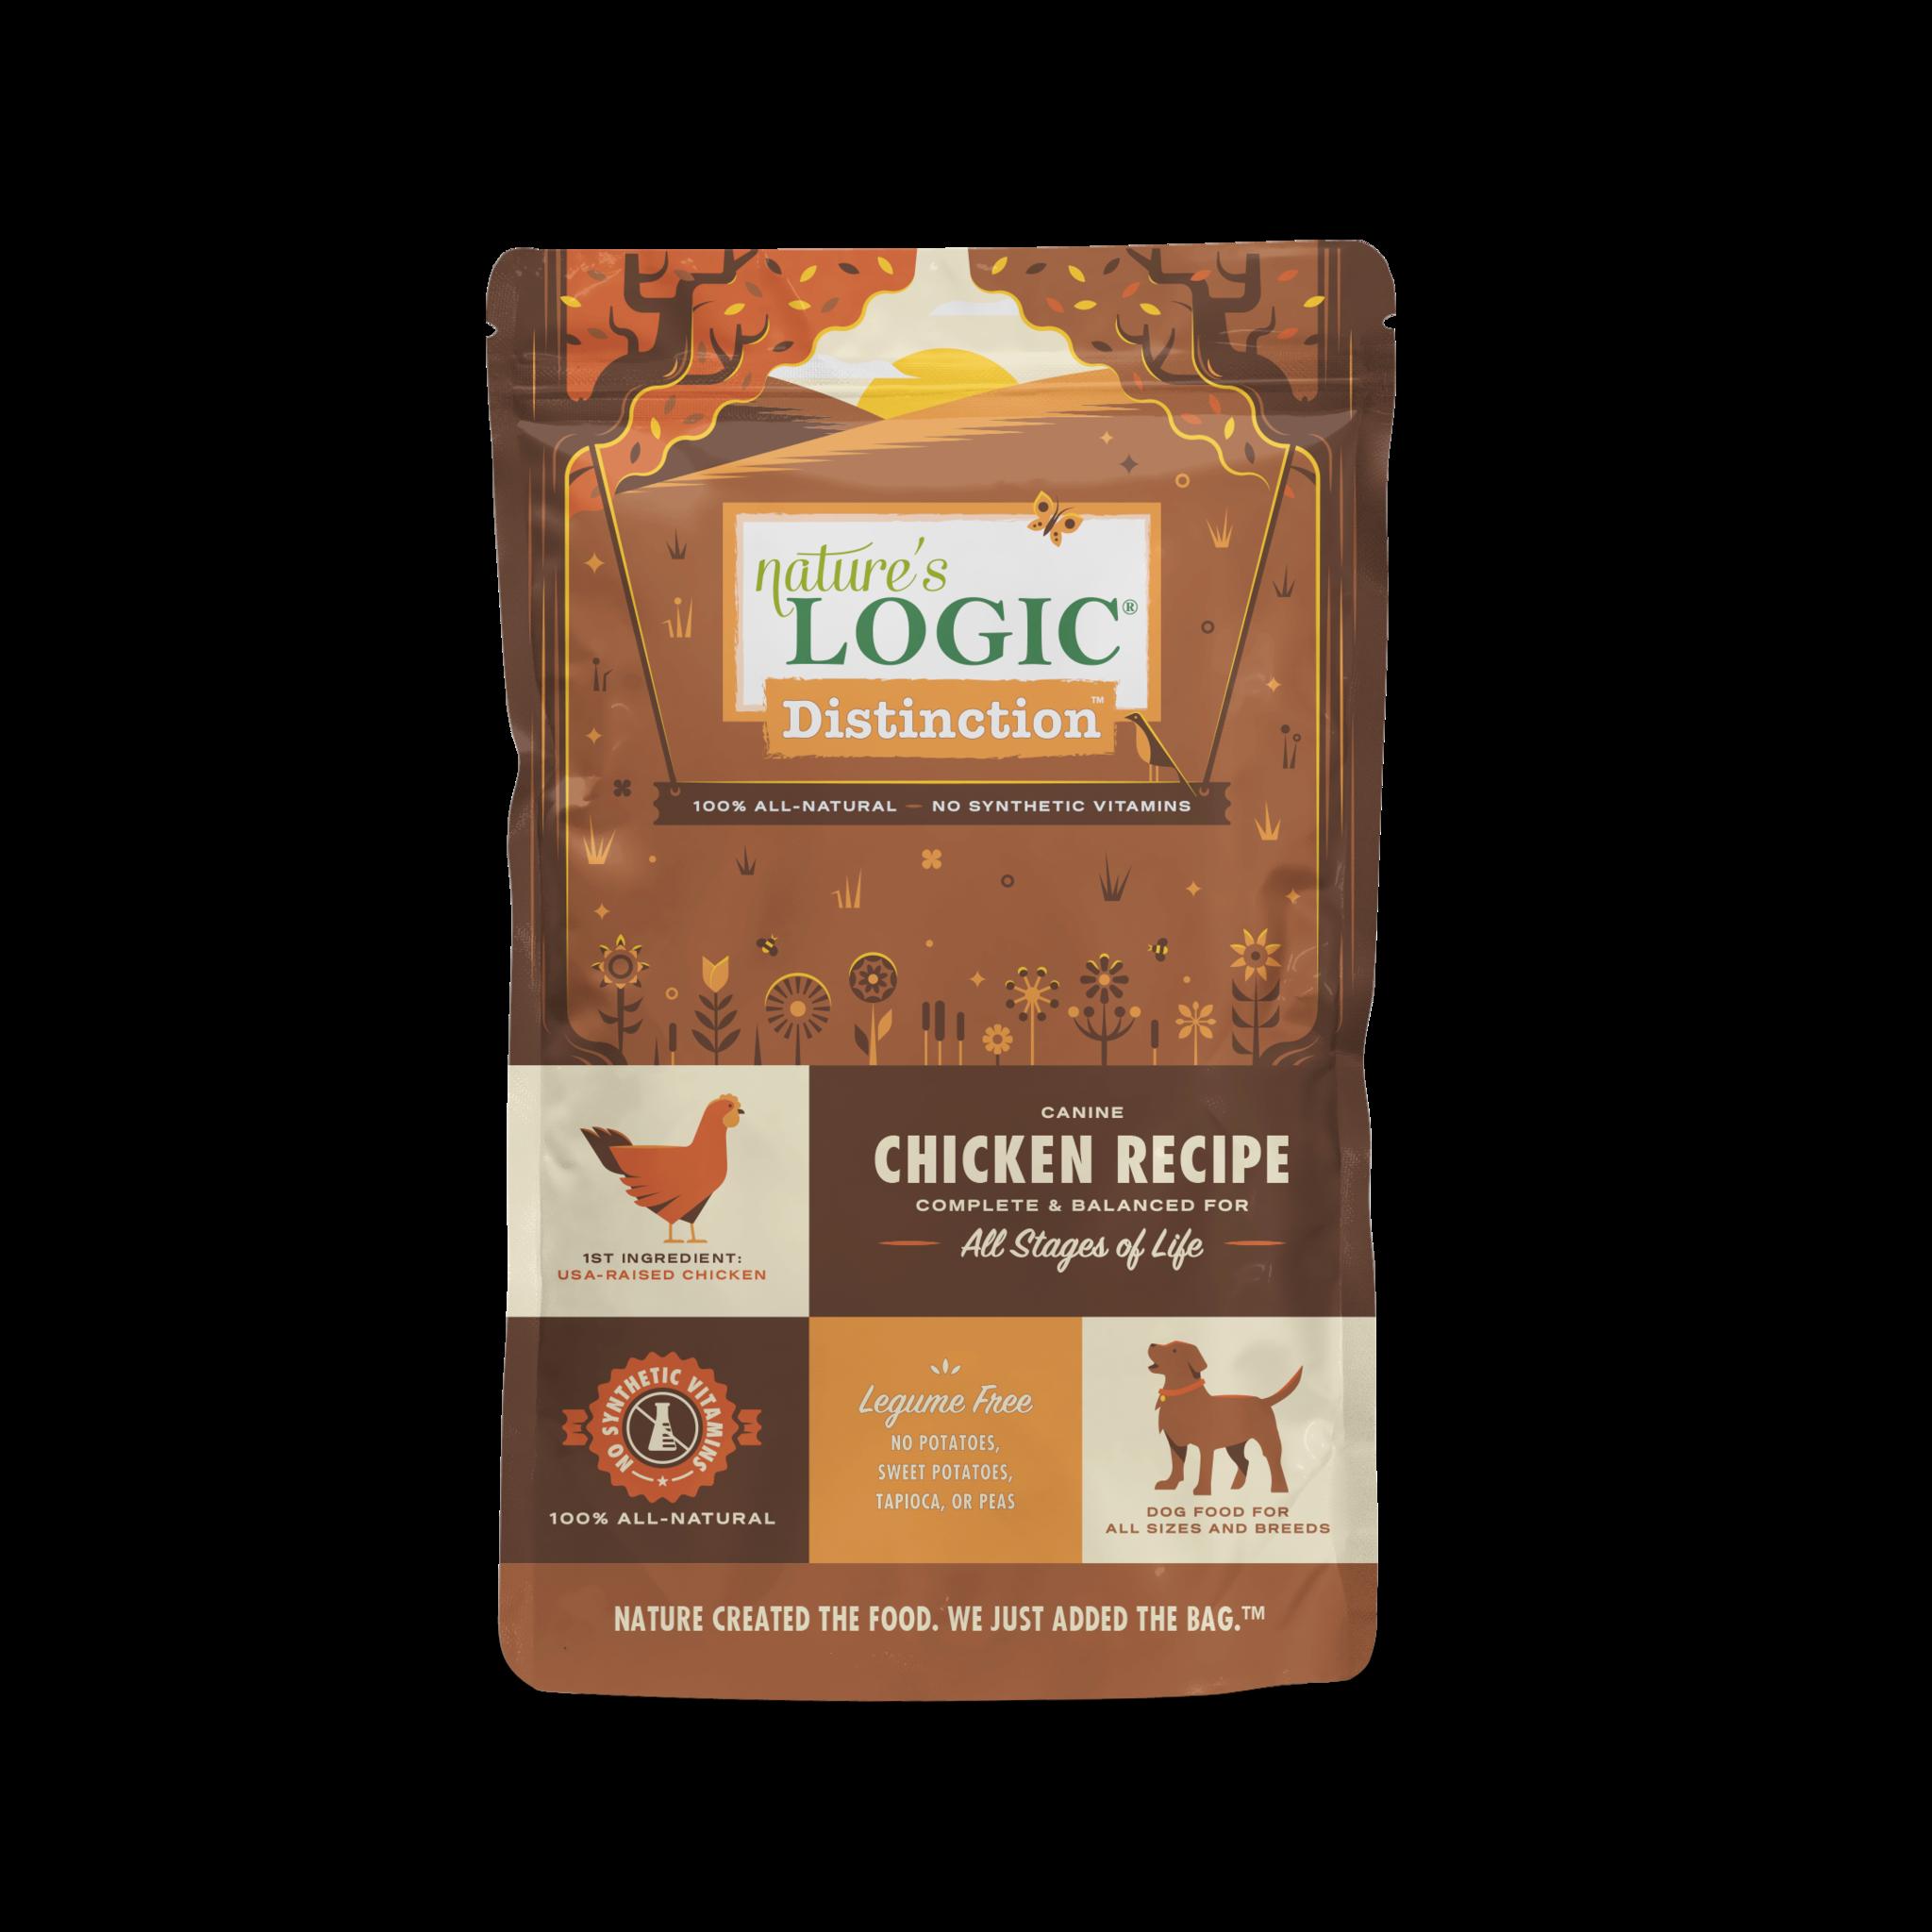 Nature's Logic Nature's Logic Distinction Chicken Dry Dog Food